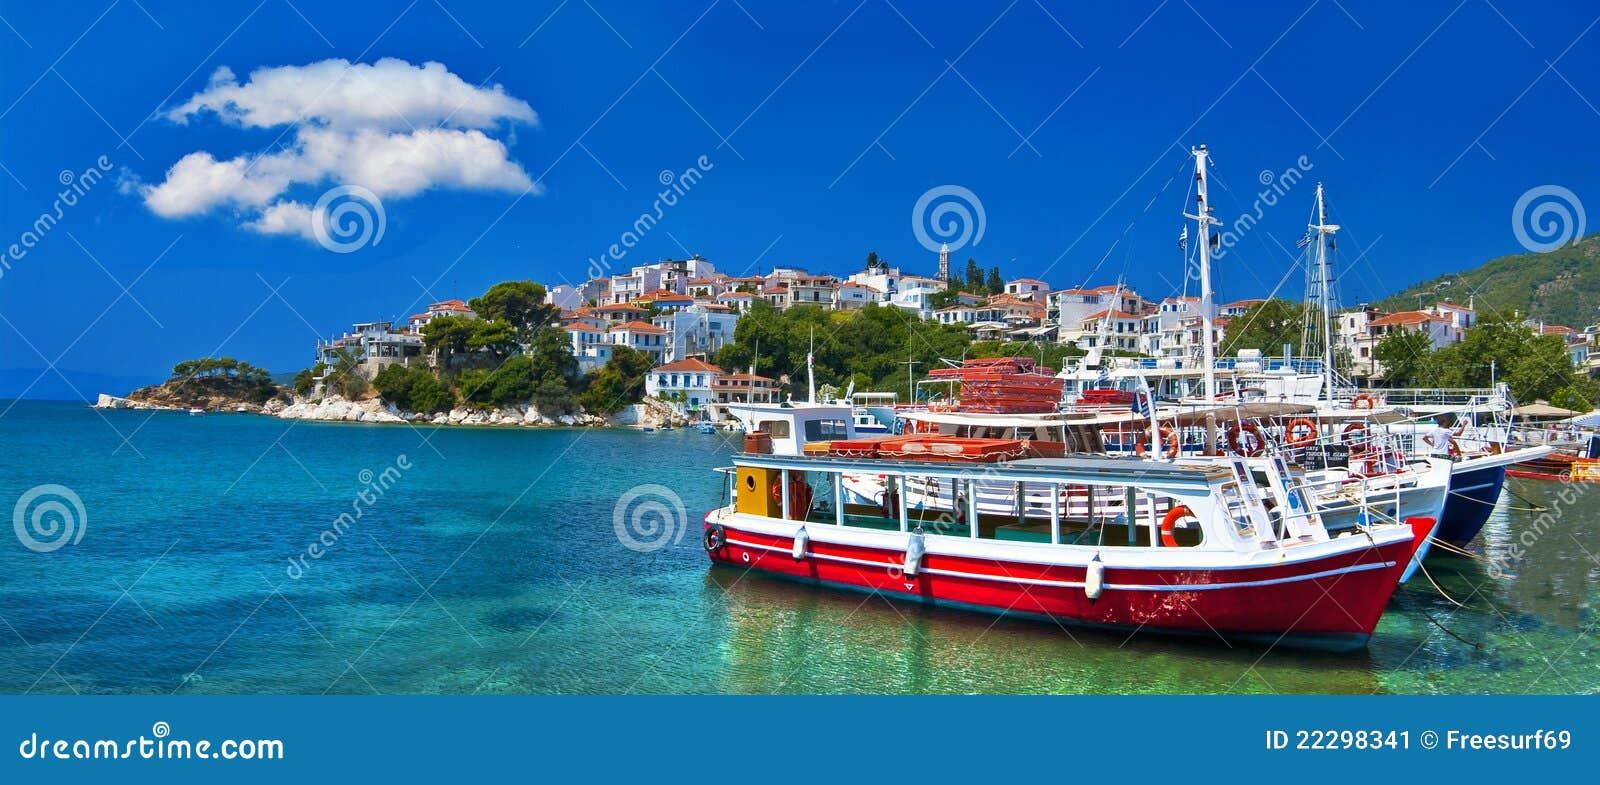 Malarskie greckie wyspy